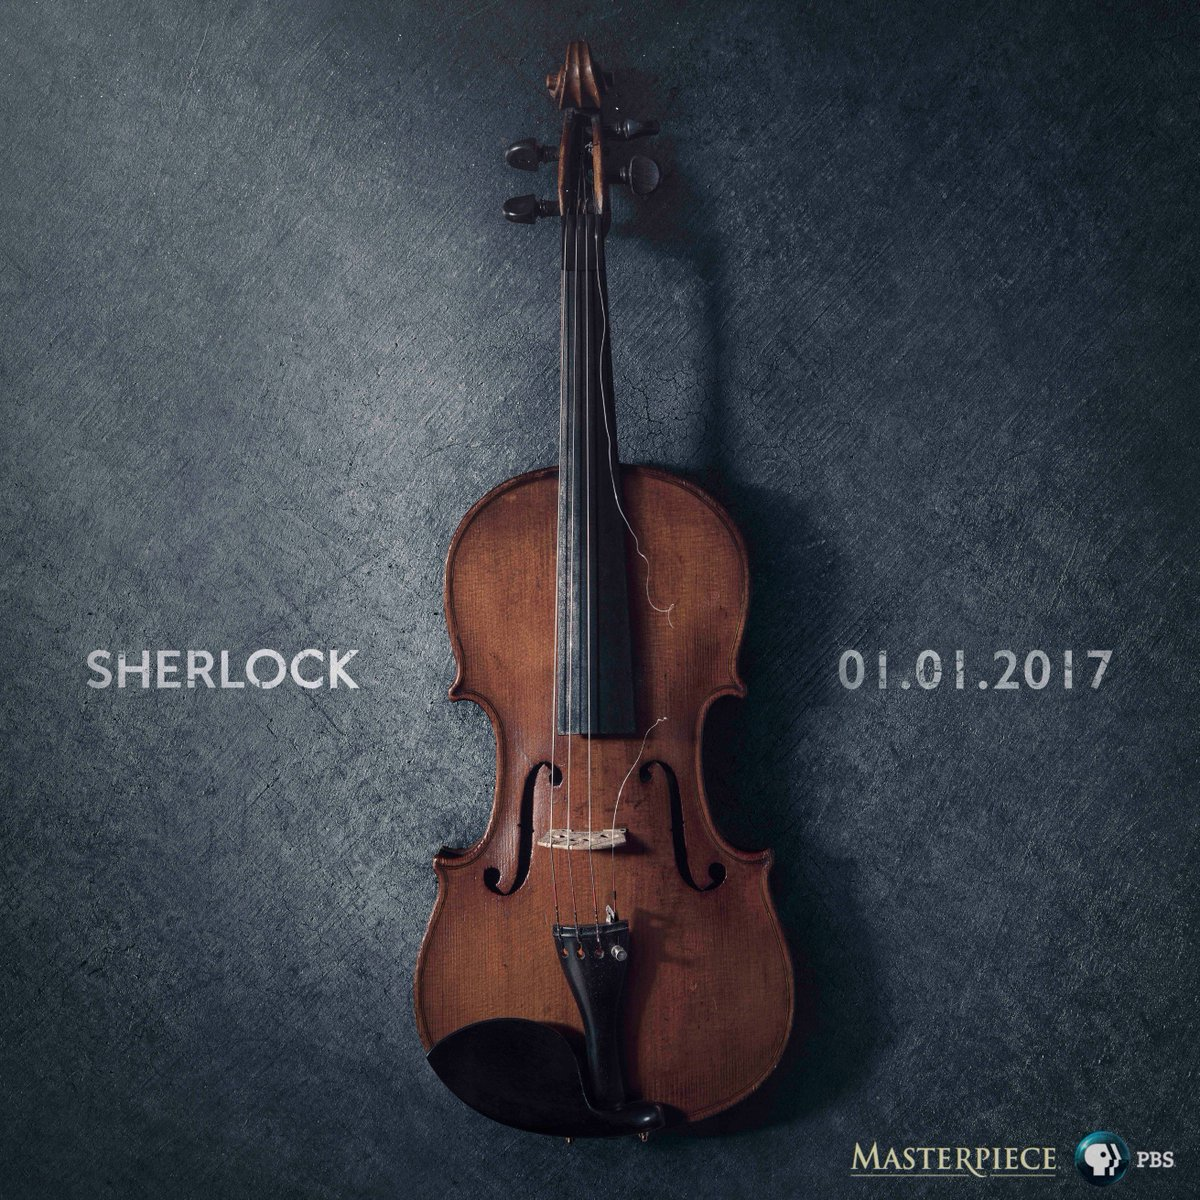 "Sherlock will return in ""The Six Thatchers"" on January 1, 2017 on MASTERPIECE on @PBS. #SherlockPBS https://t.co/kFpQ58bHjl"